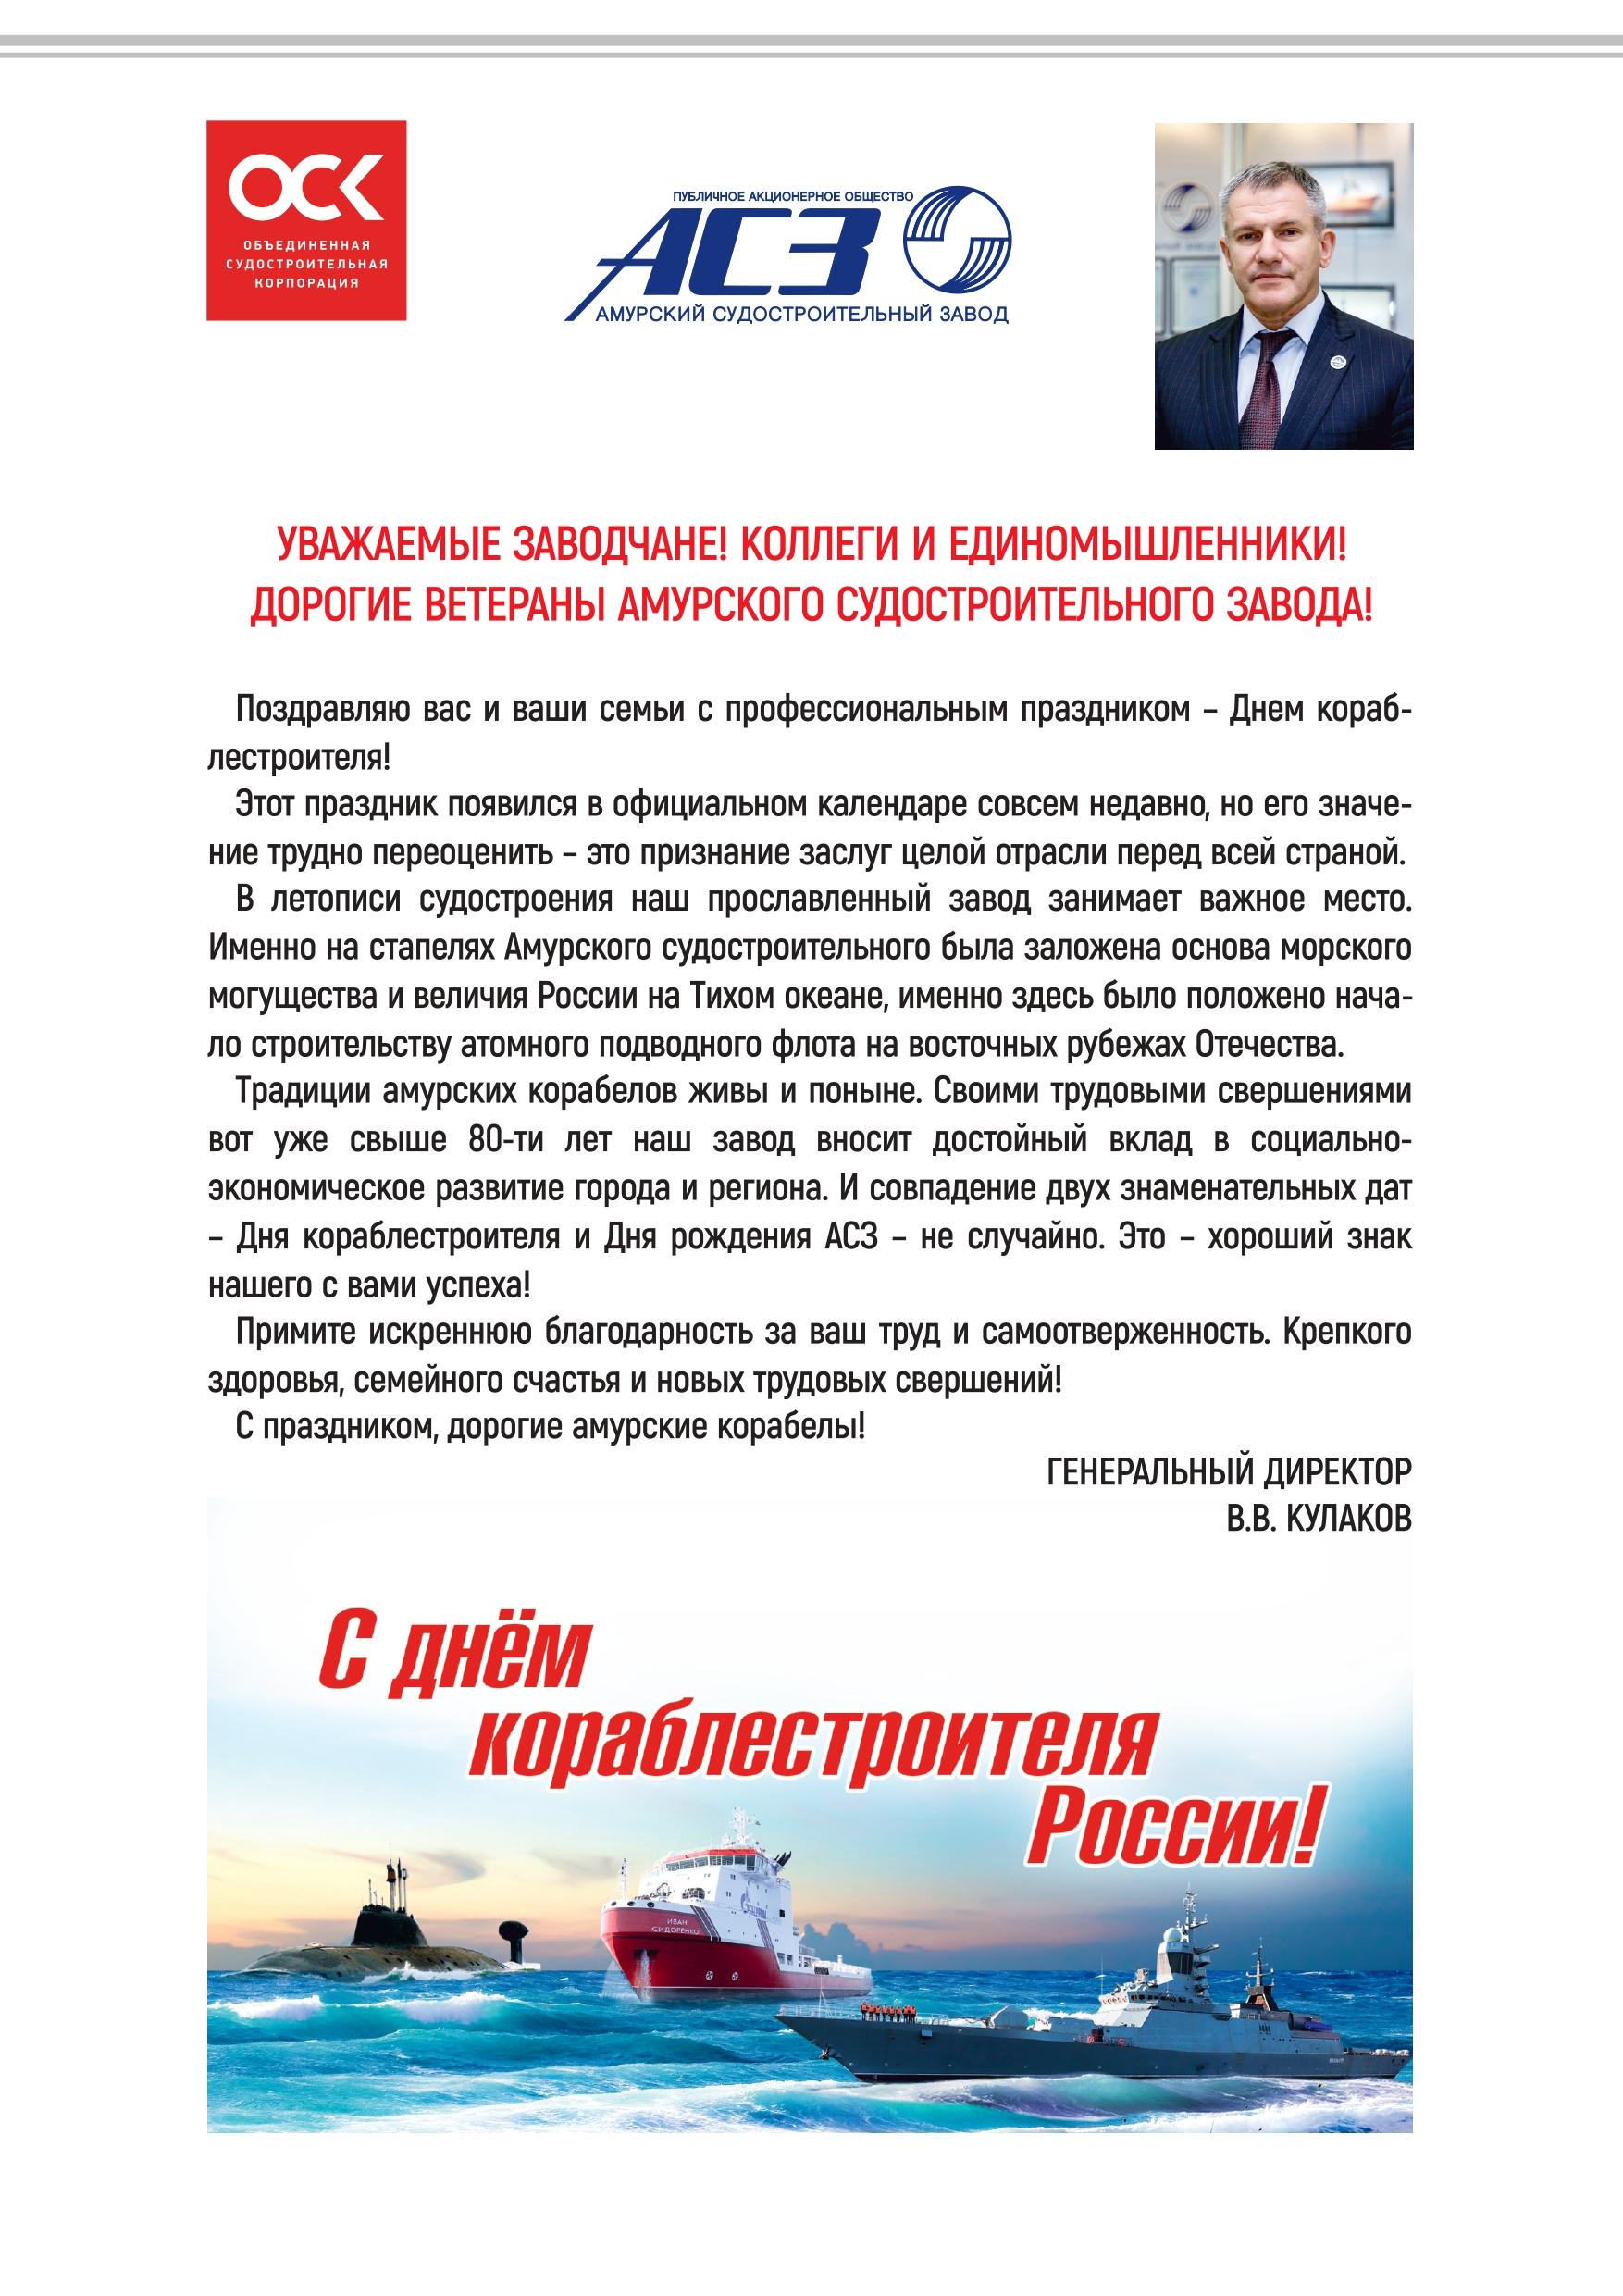 Плакат С днем кораблестроителя 2019_page-0001